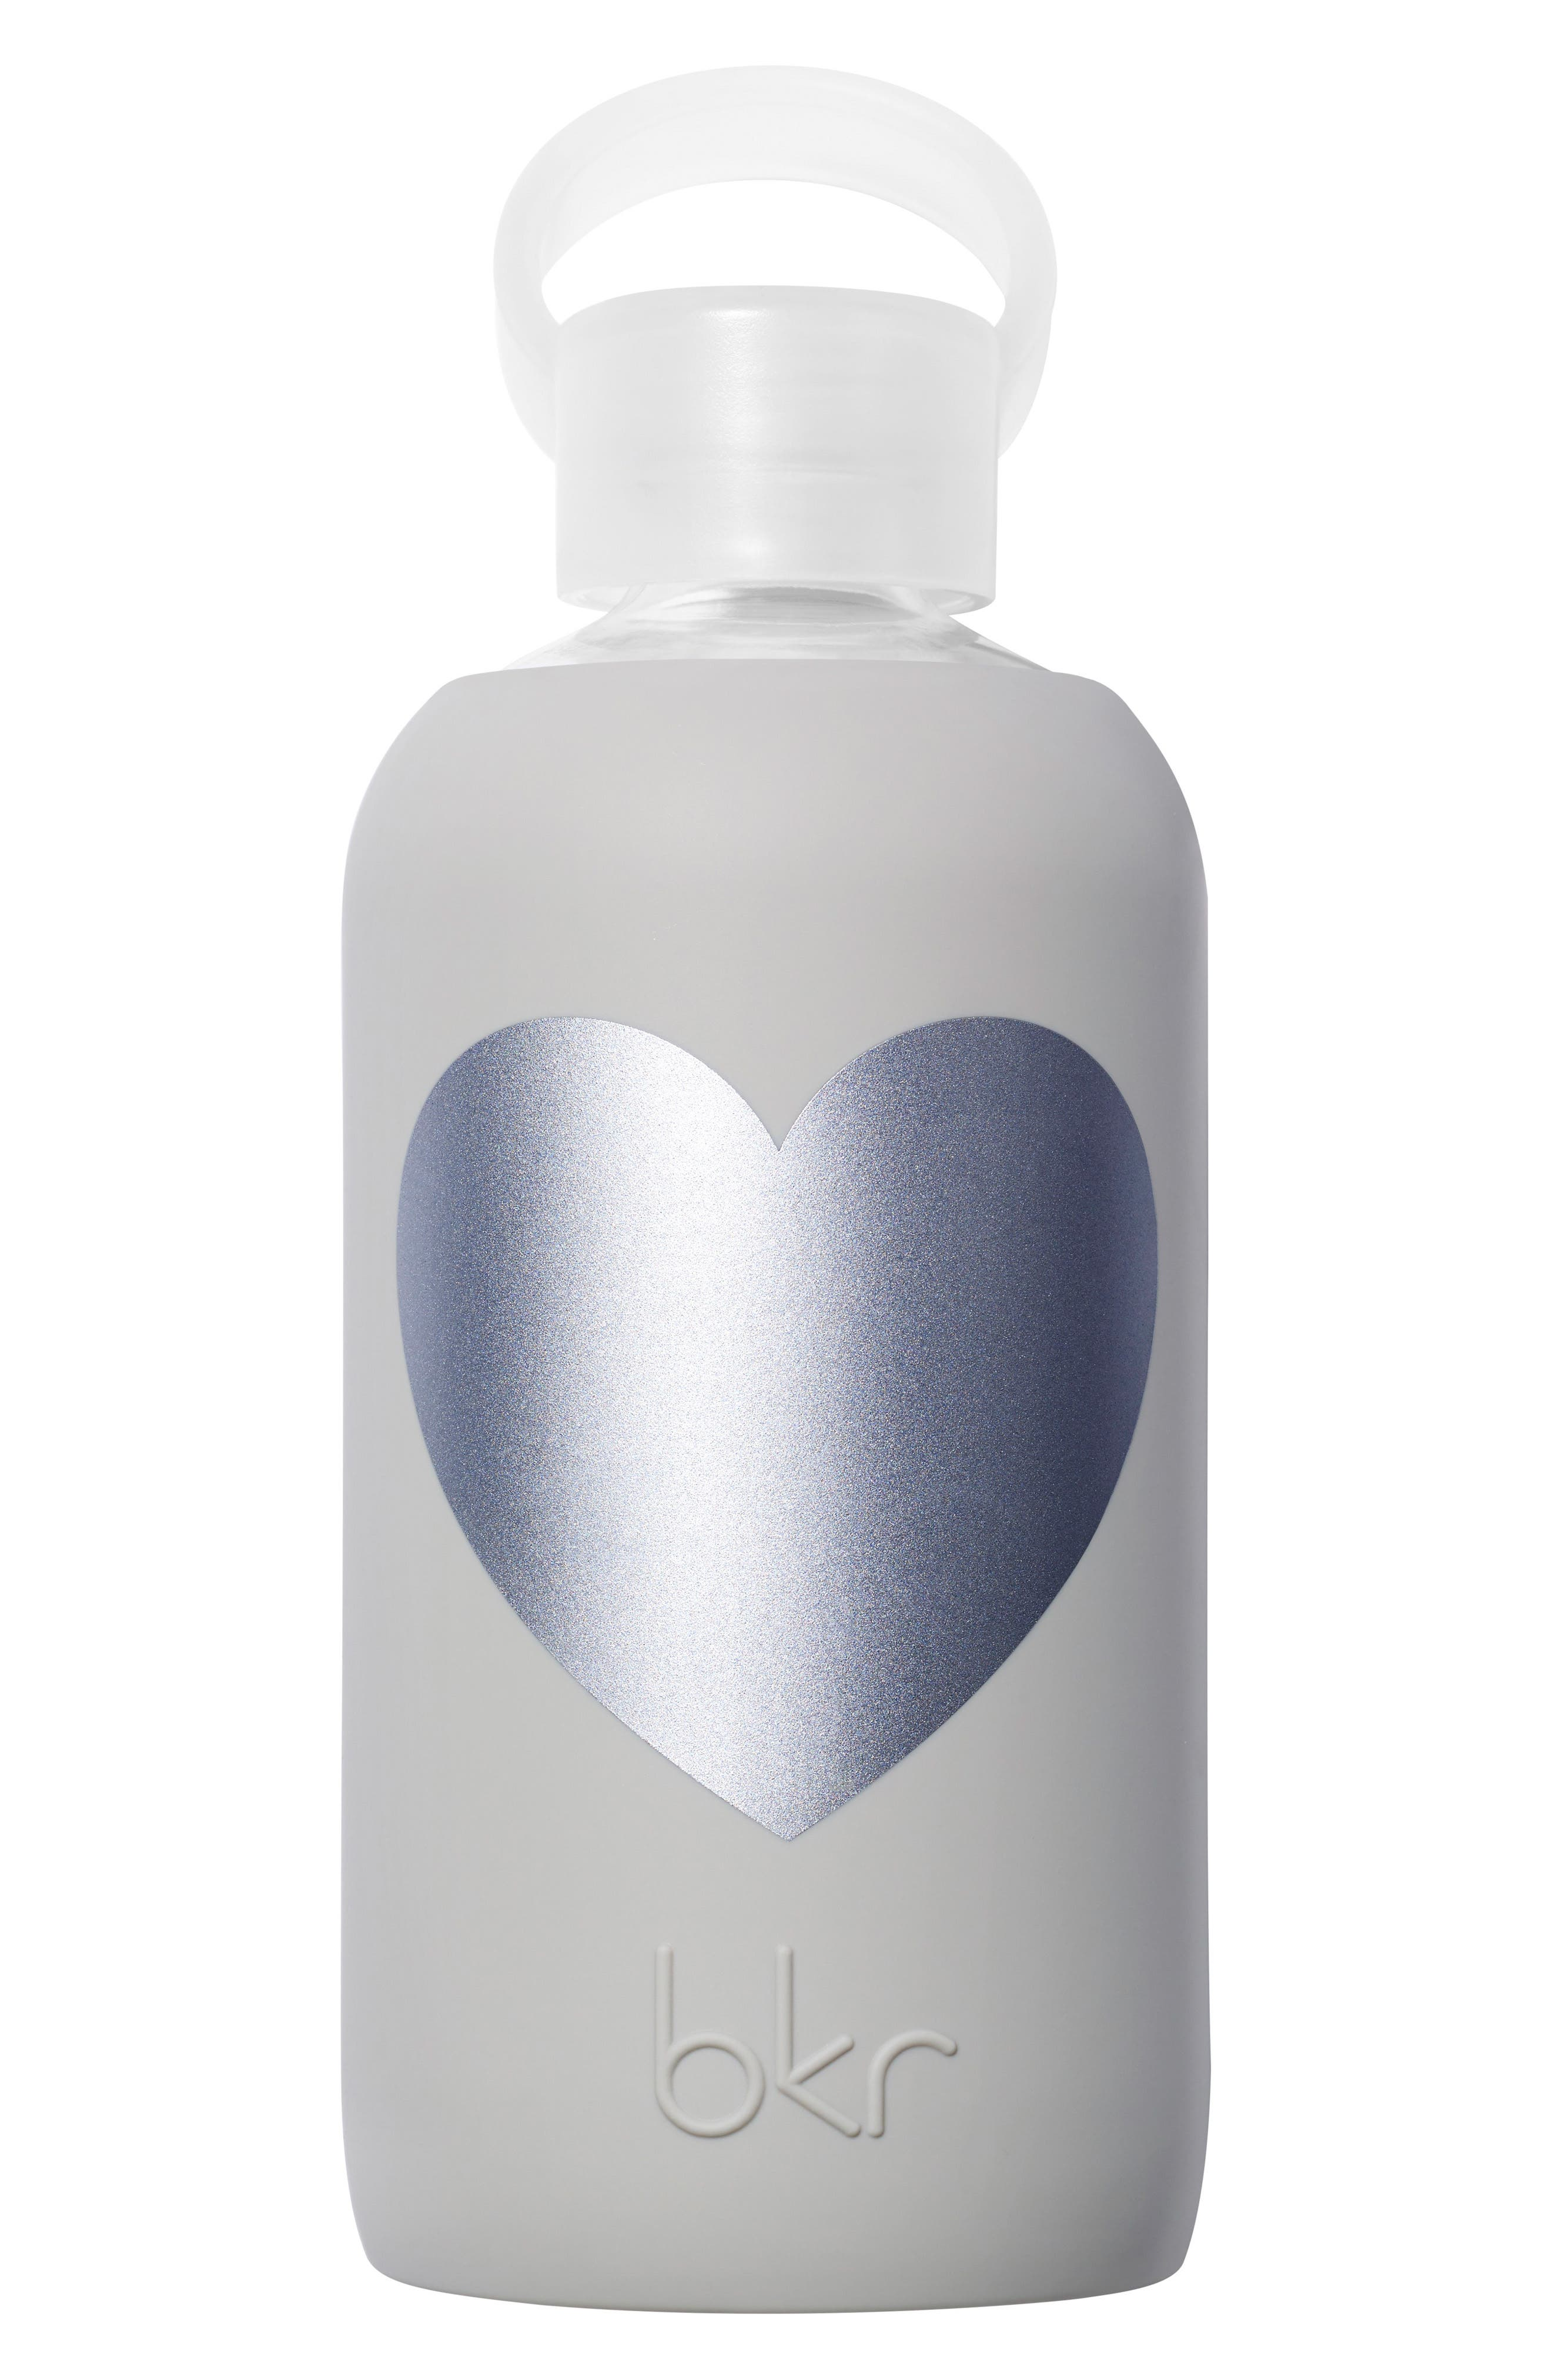 Heart 16-Ounce Glass Water Bottle,                             Main thumbnail 1, color,                             020